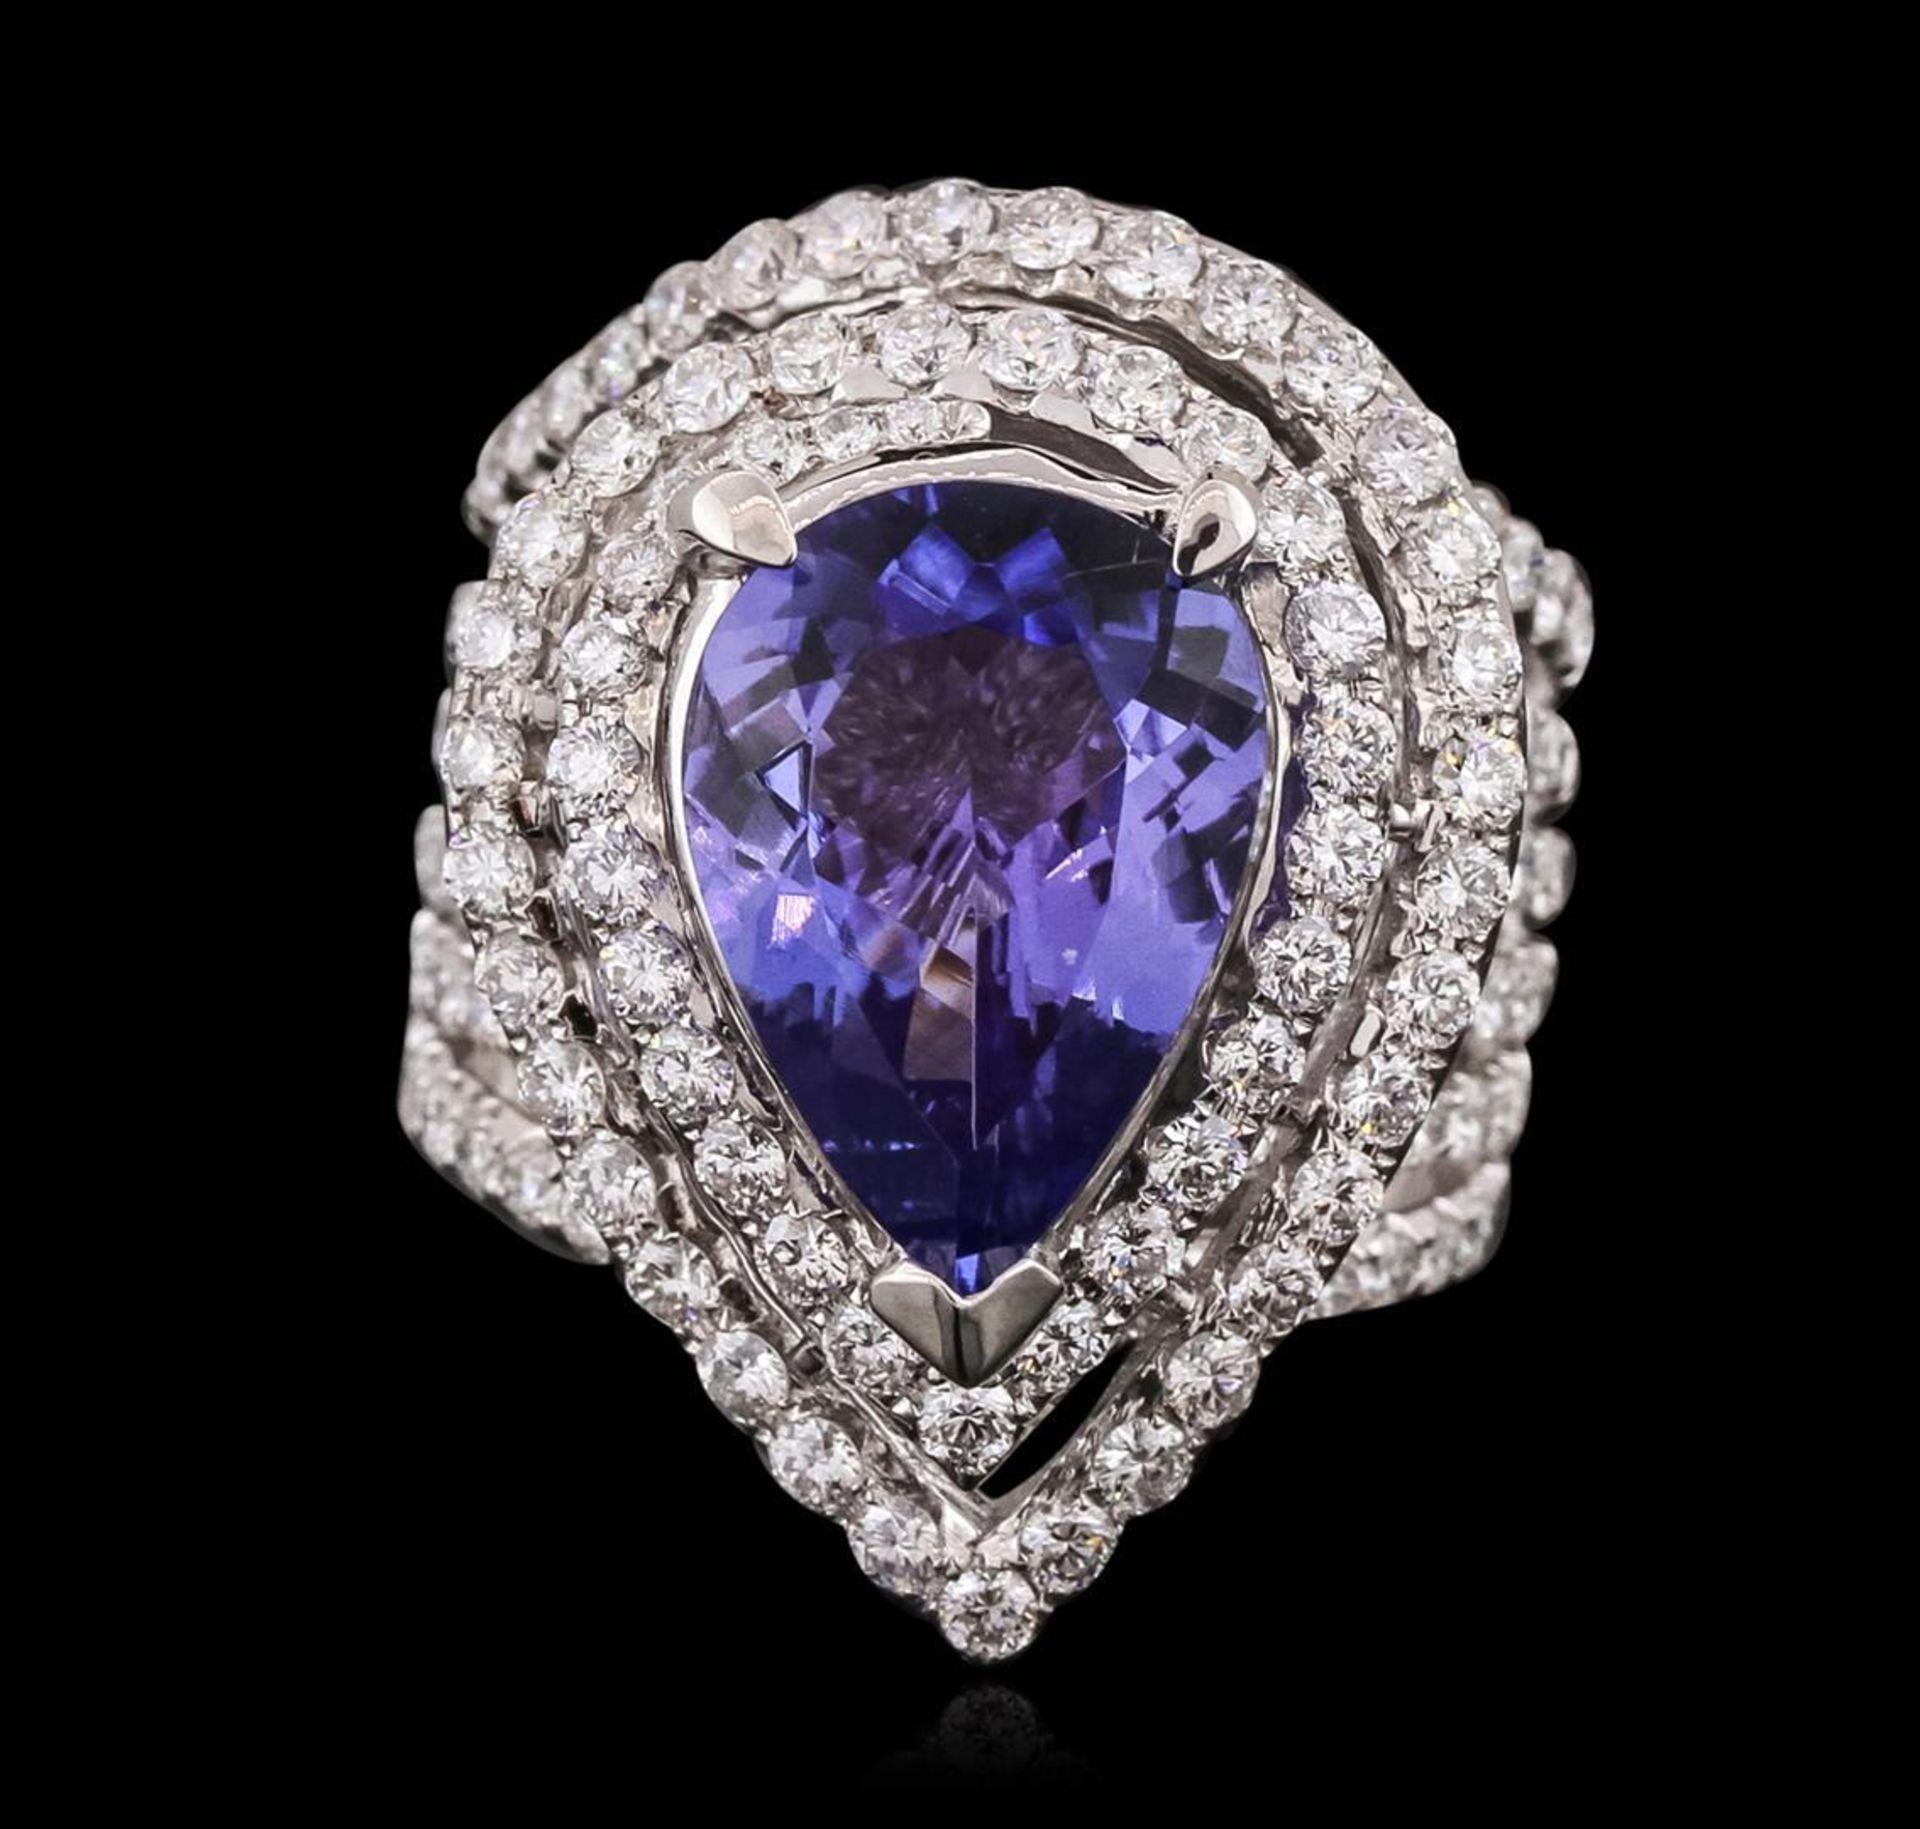 18KT White Gold 6.53ct Tanzanite and Diamond Ring - Image 2 of 3